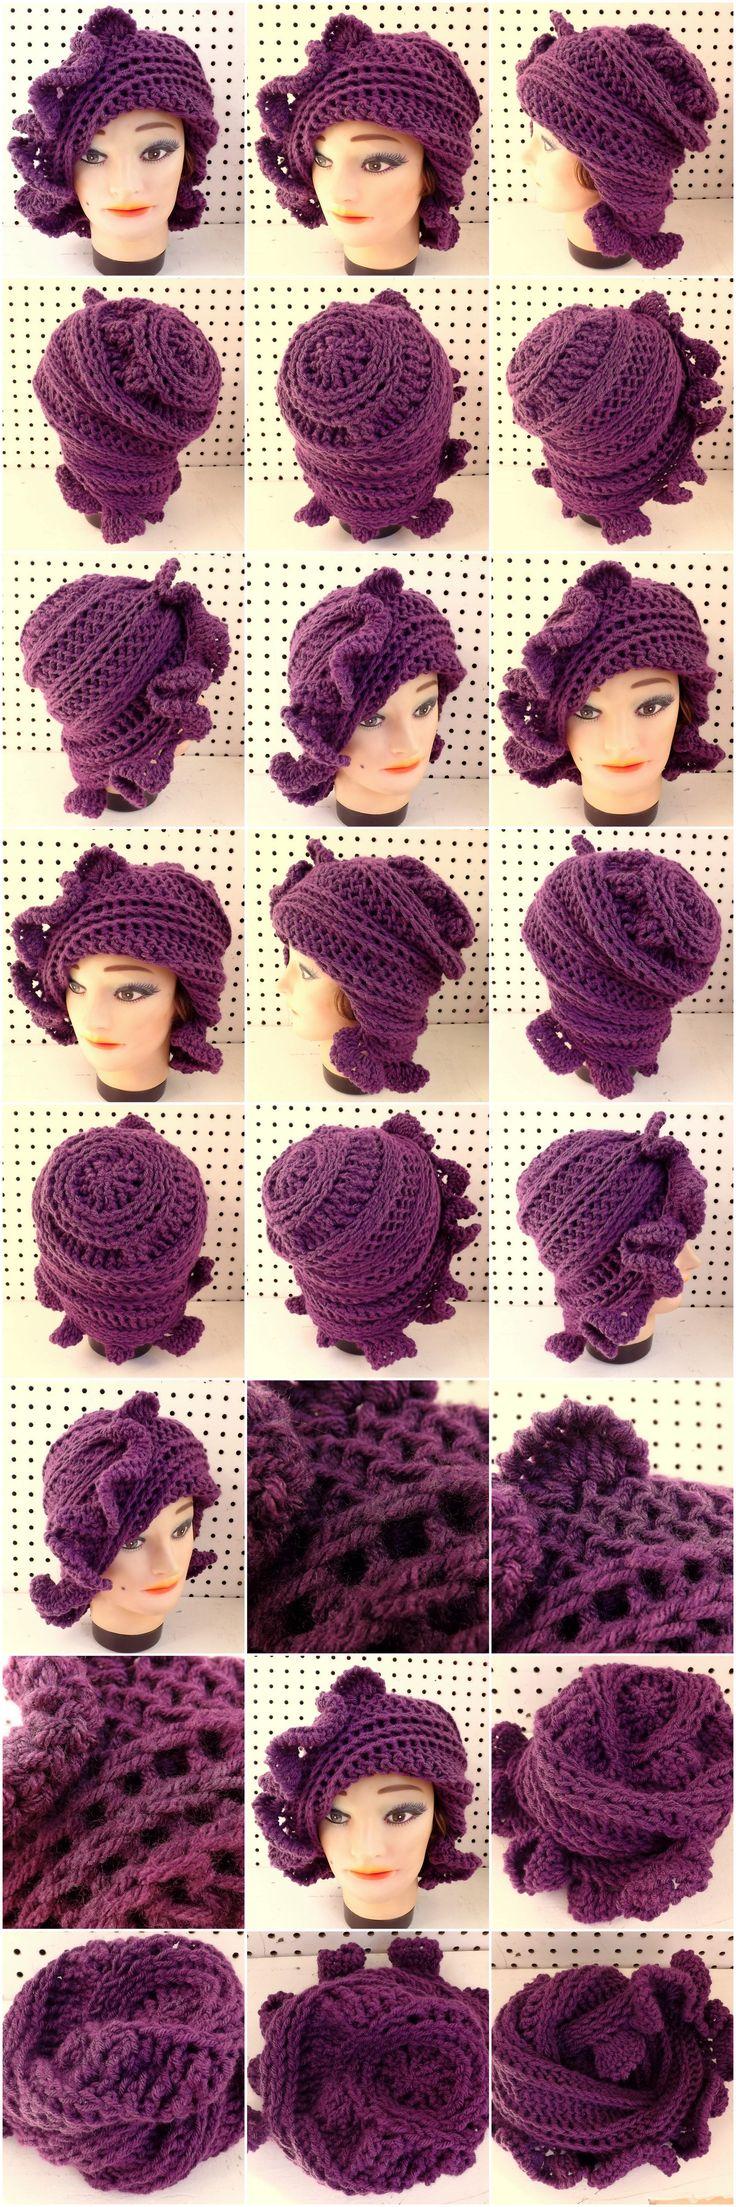 CYNTHIA Crochet Beanie Hat in Mixed Berry Purple